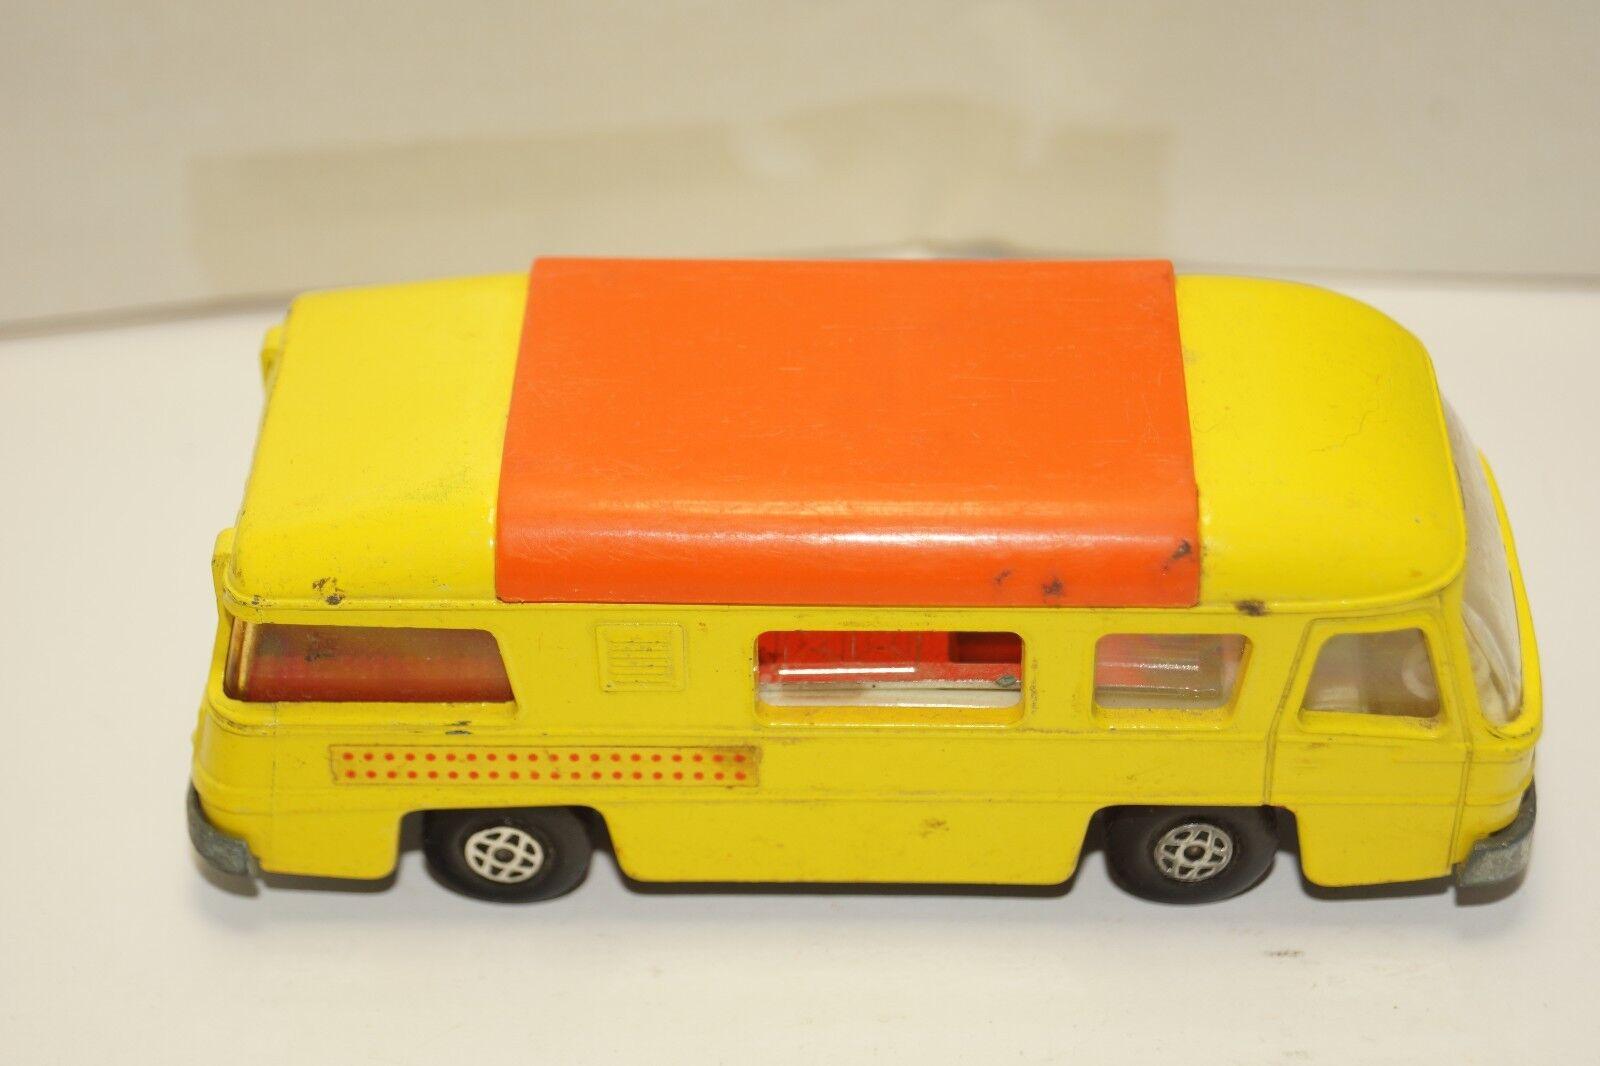 ORIGINAL Matchbox Matchbox Matchbox - Speed Kings - K-27 Camping Cruiser - giallo - arancia Roof 49ed26